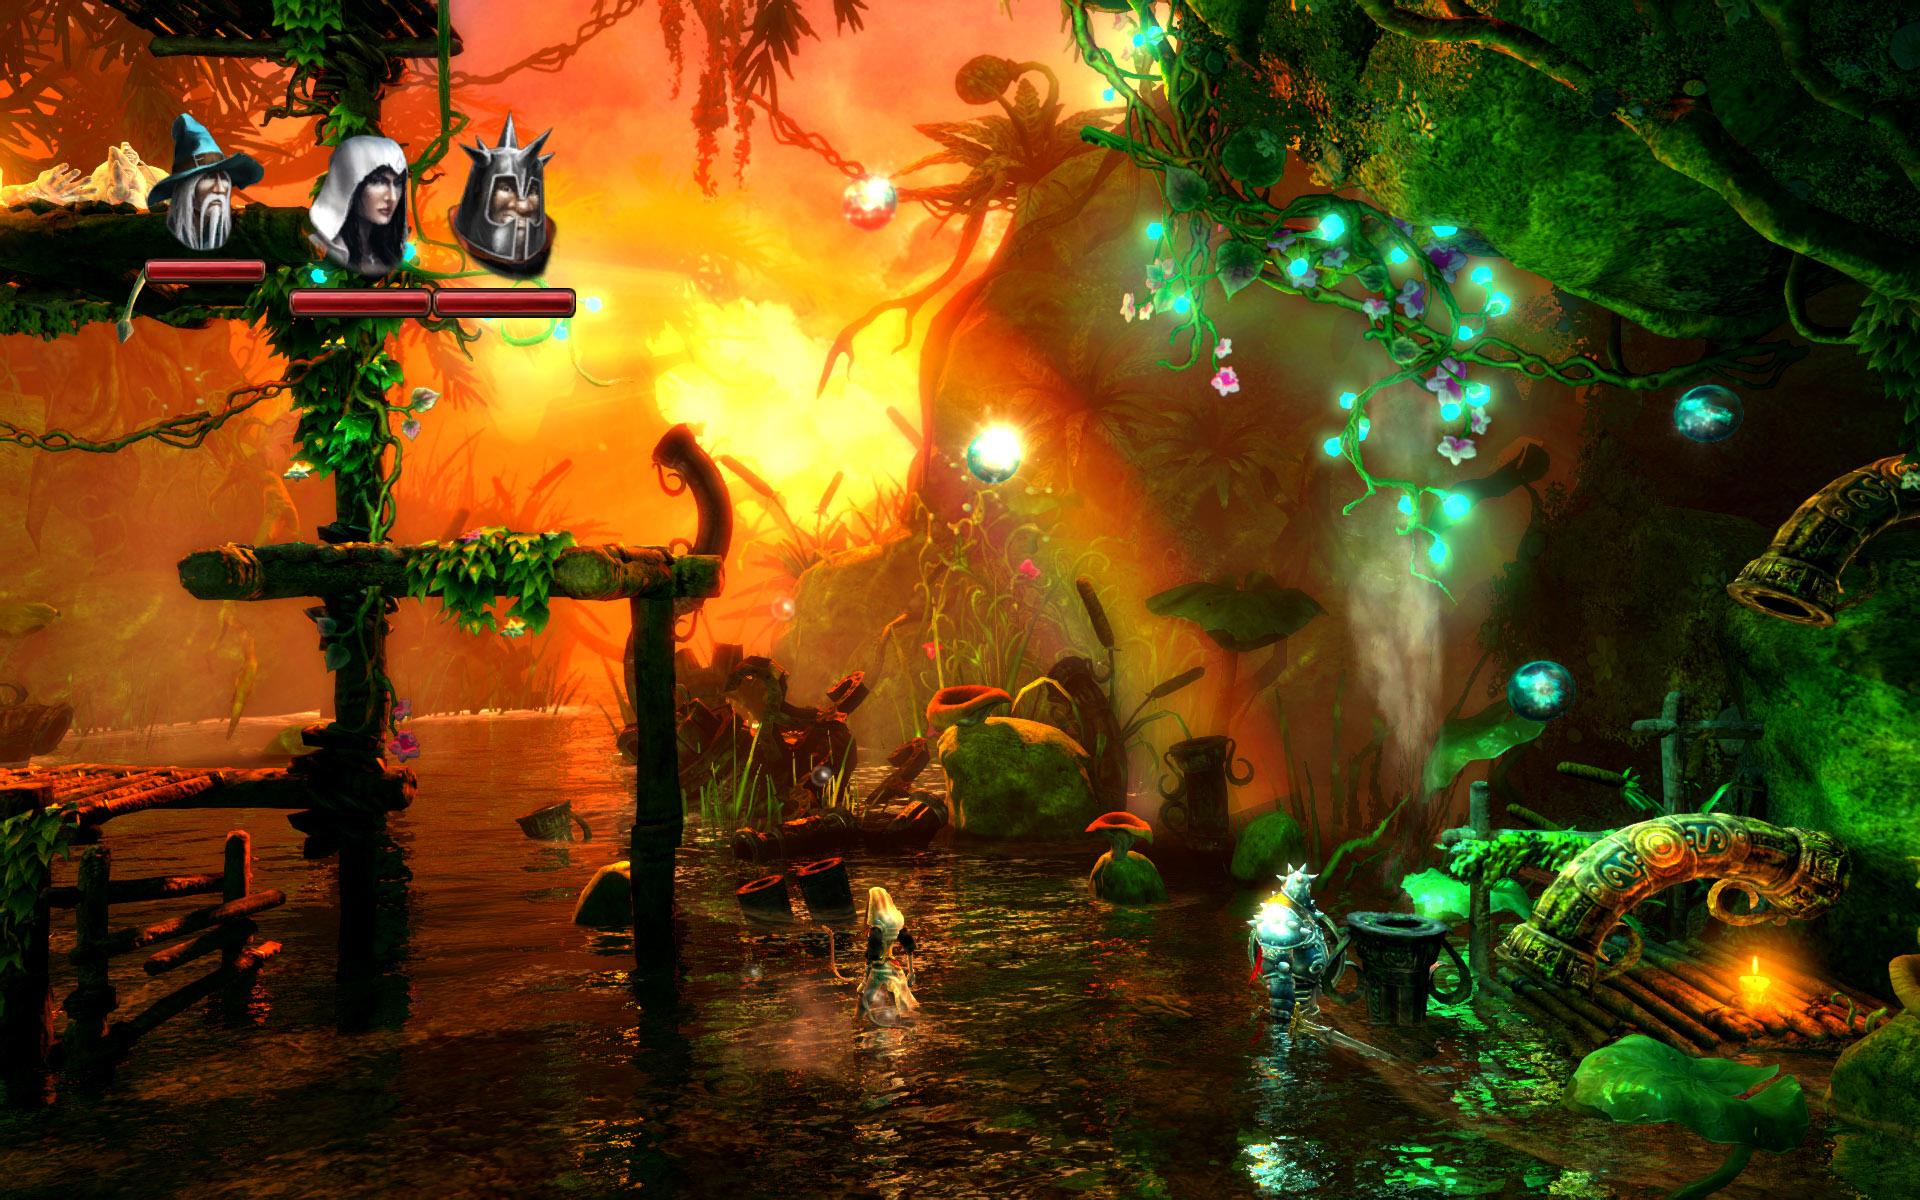 Game Trine 2 Free Download